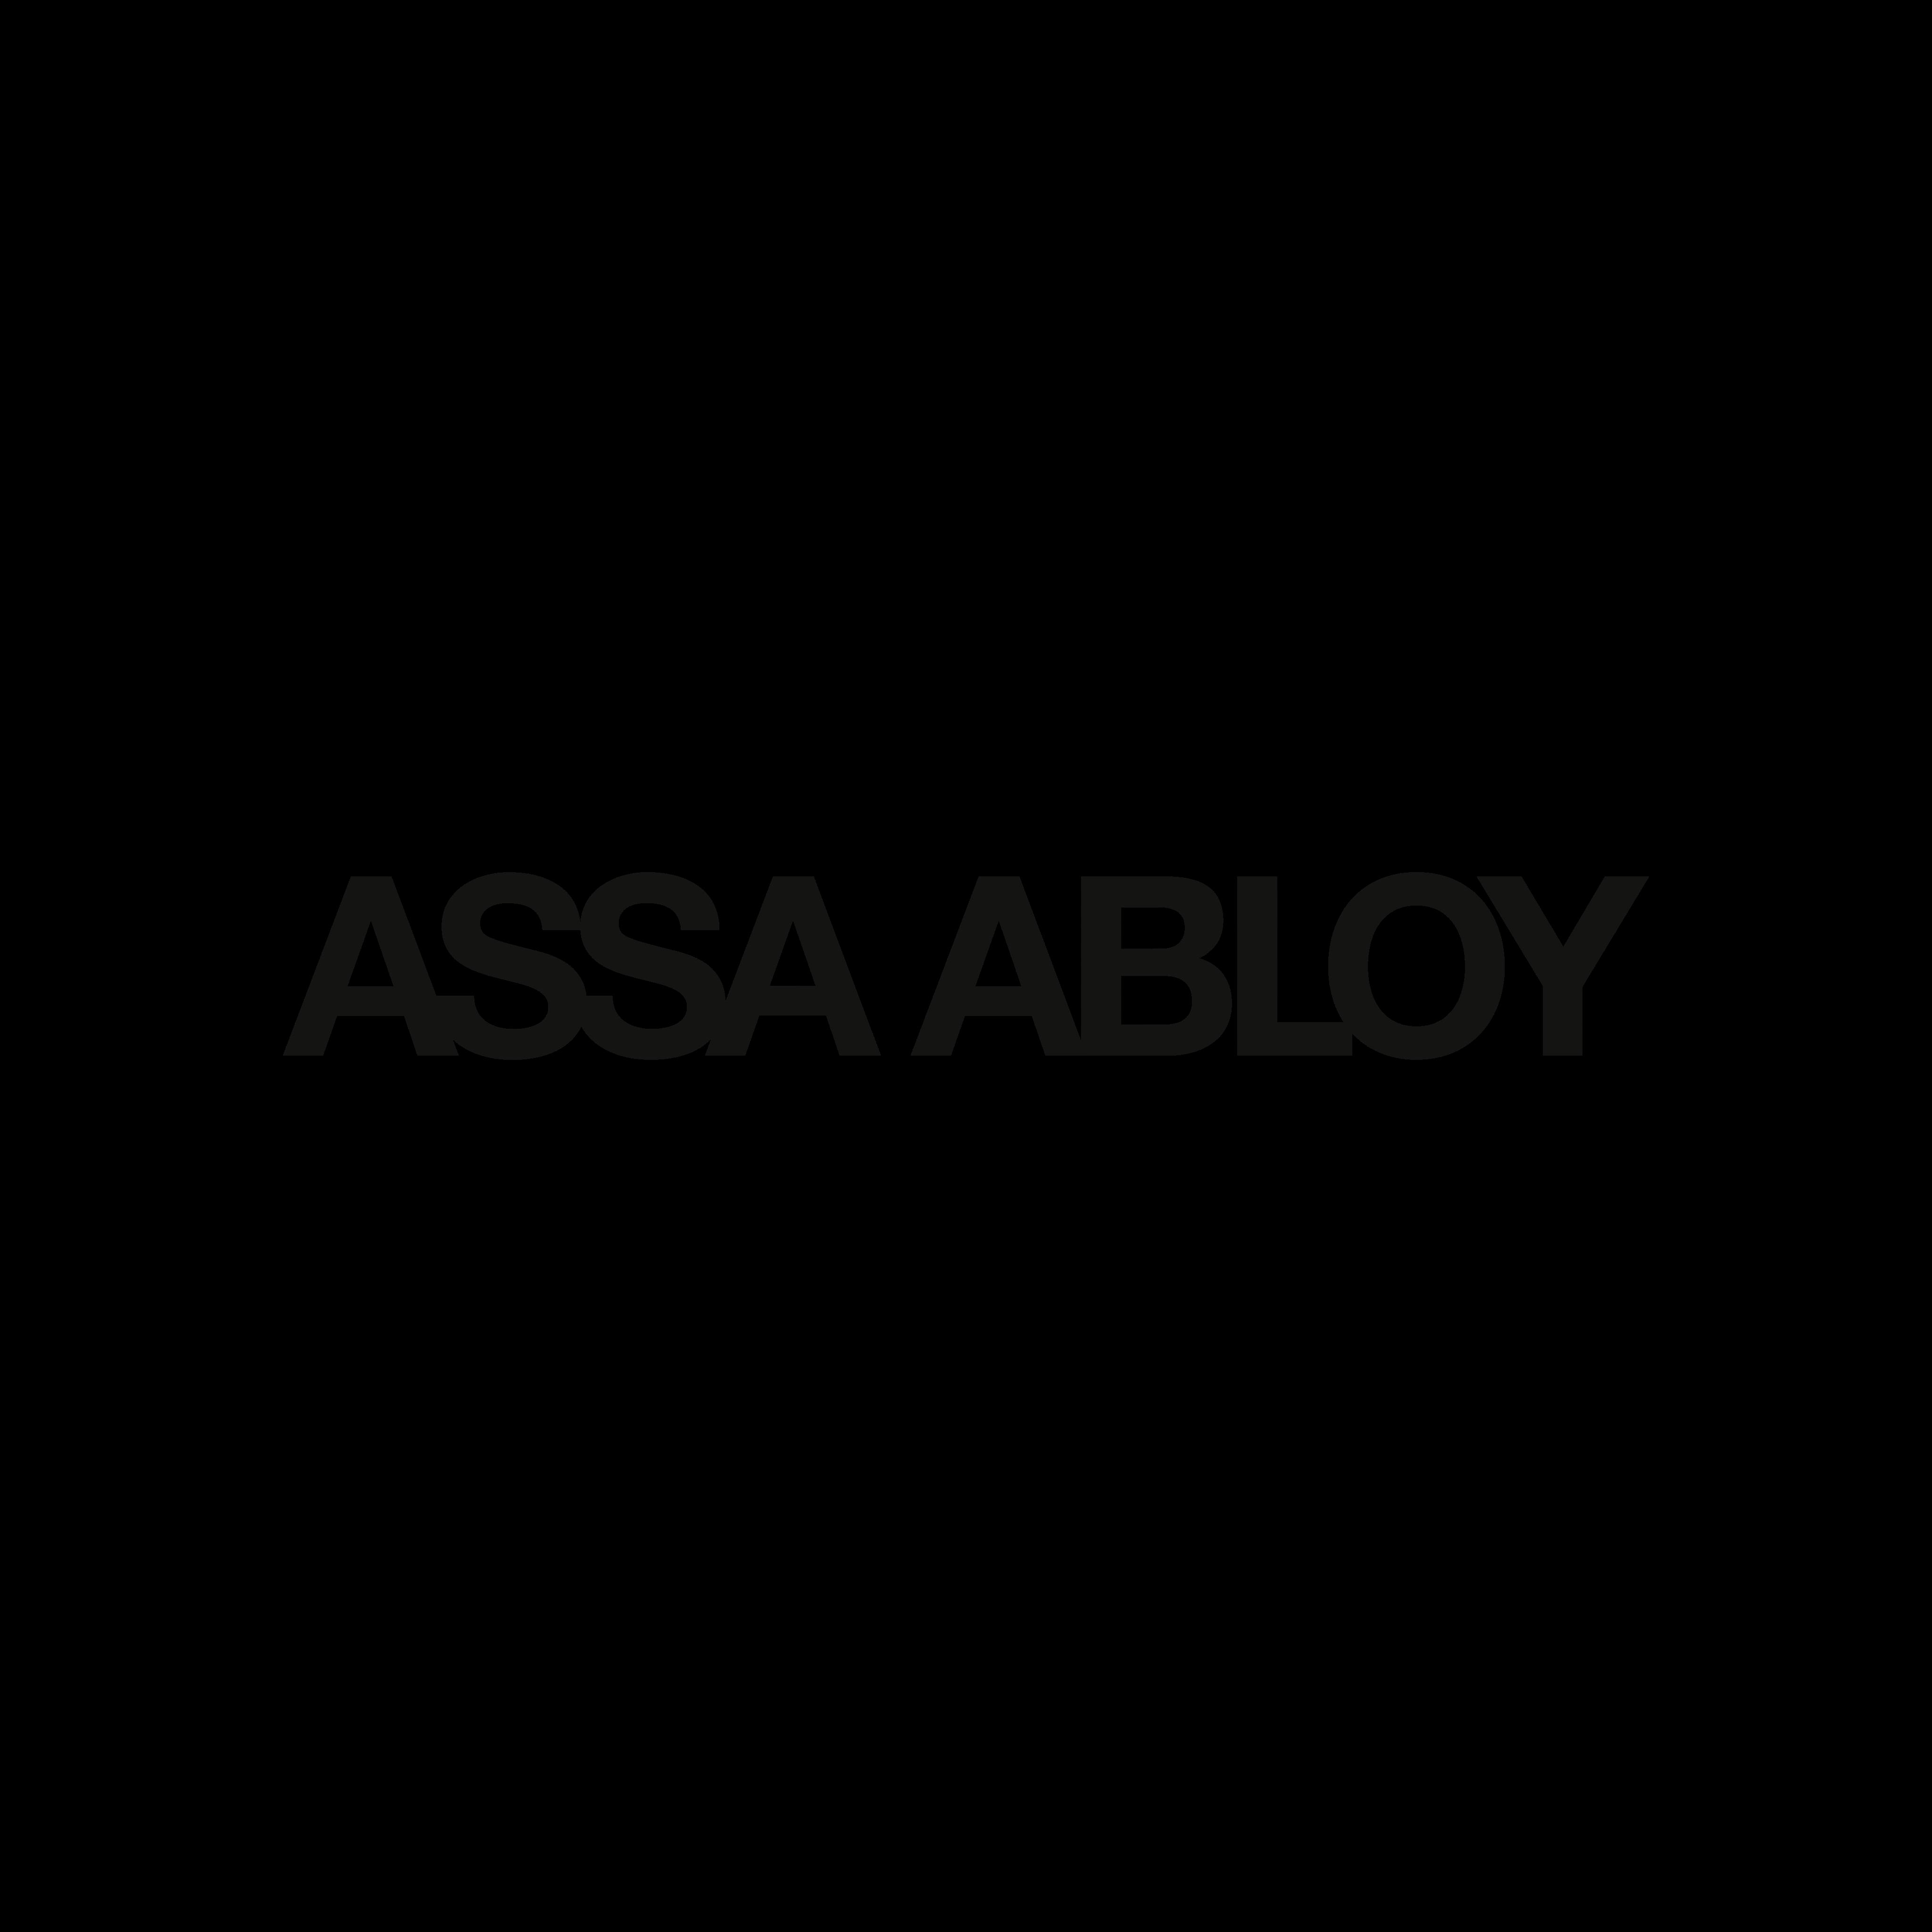 assa abloy logo 0 - ASSA ABLOY Logo